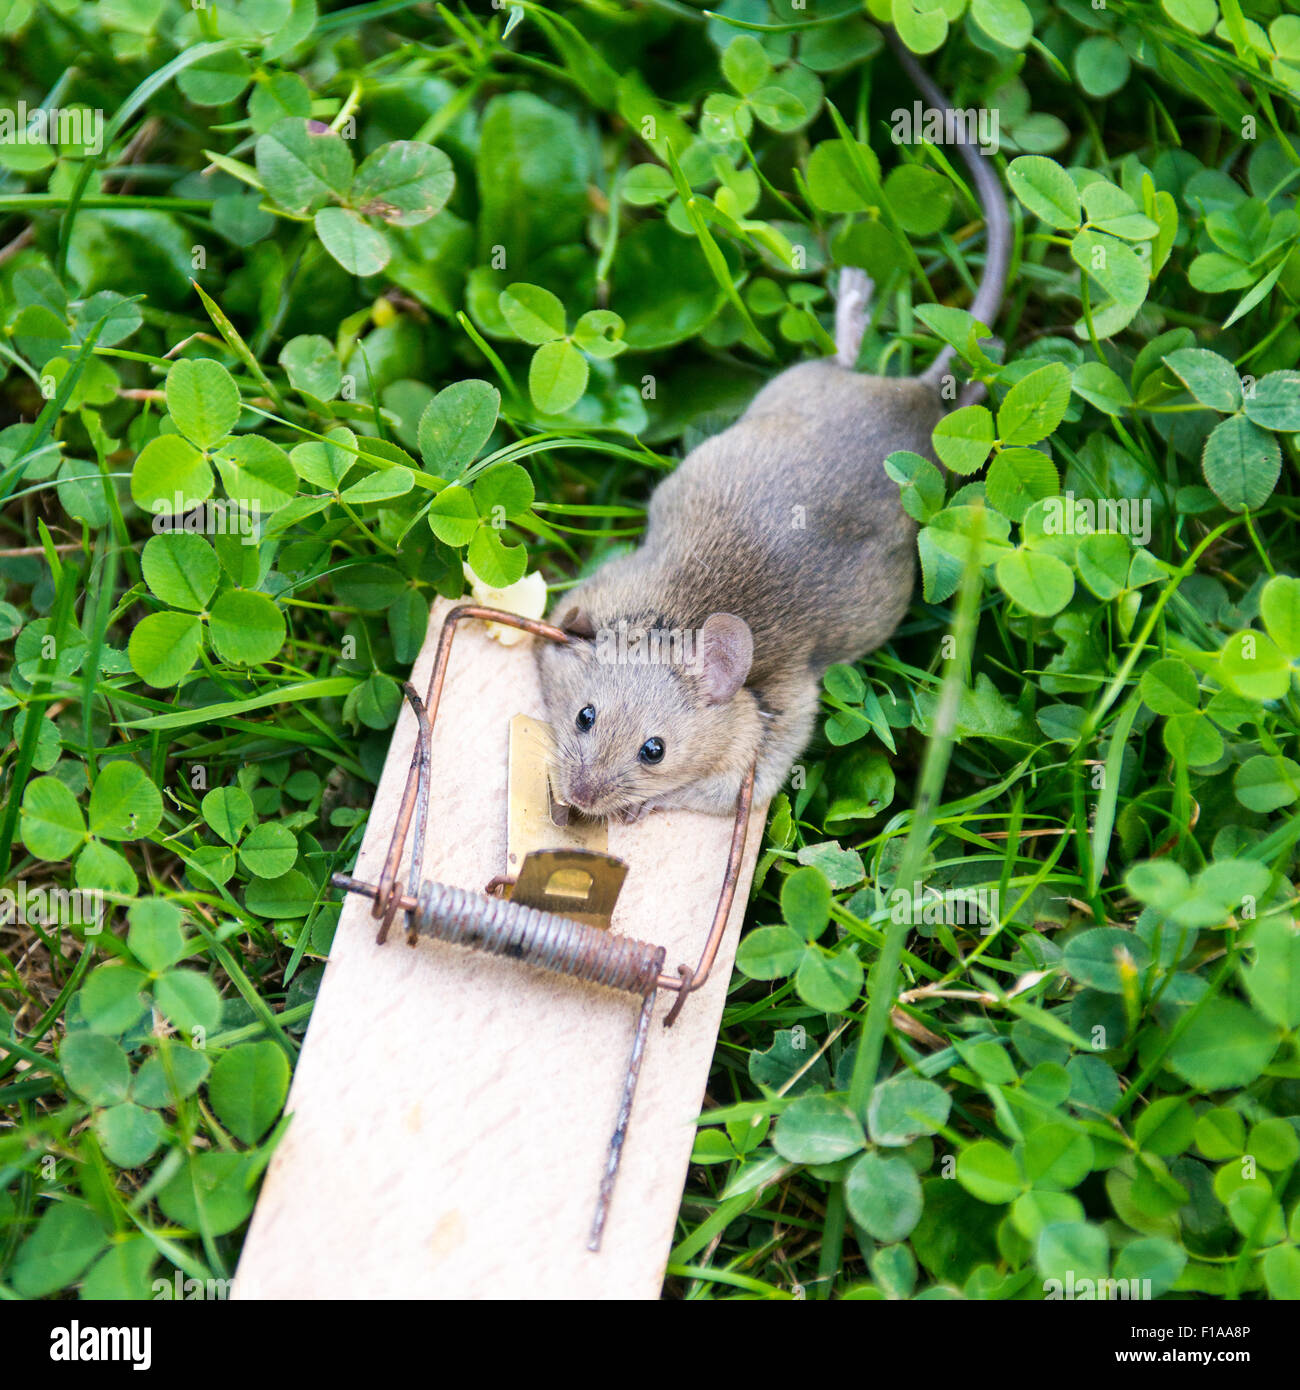 dead rat on grass stock photos u0026 dead rat on grass stock images